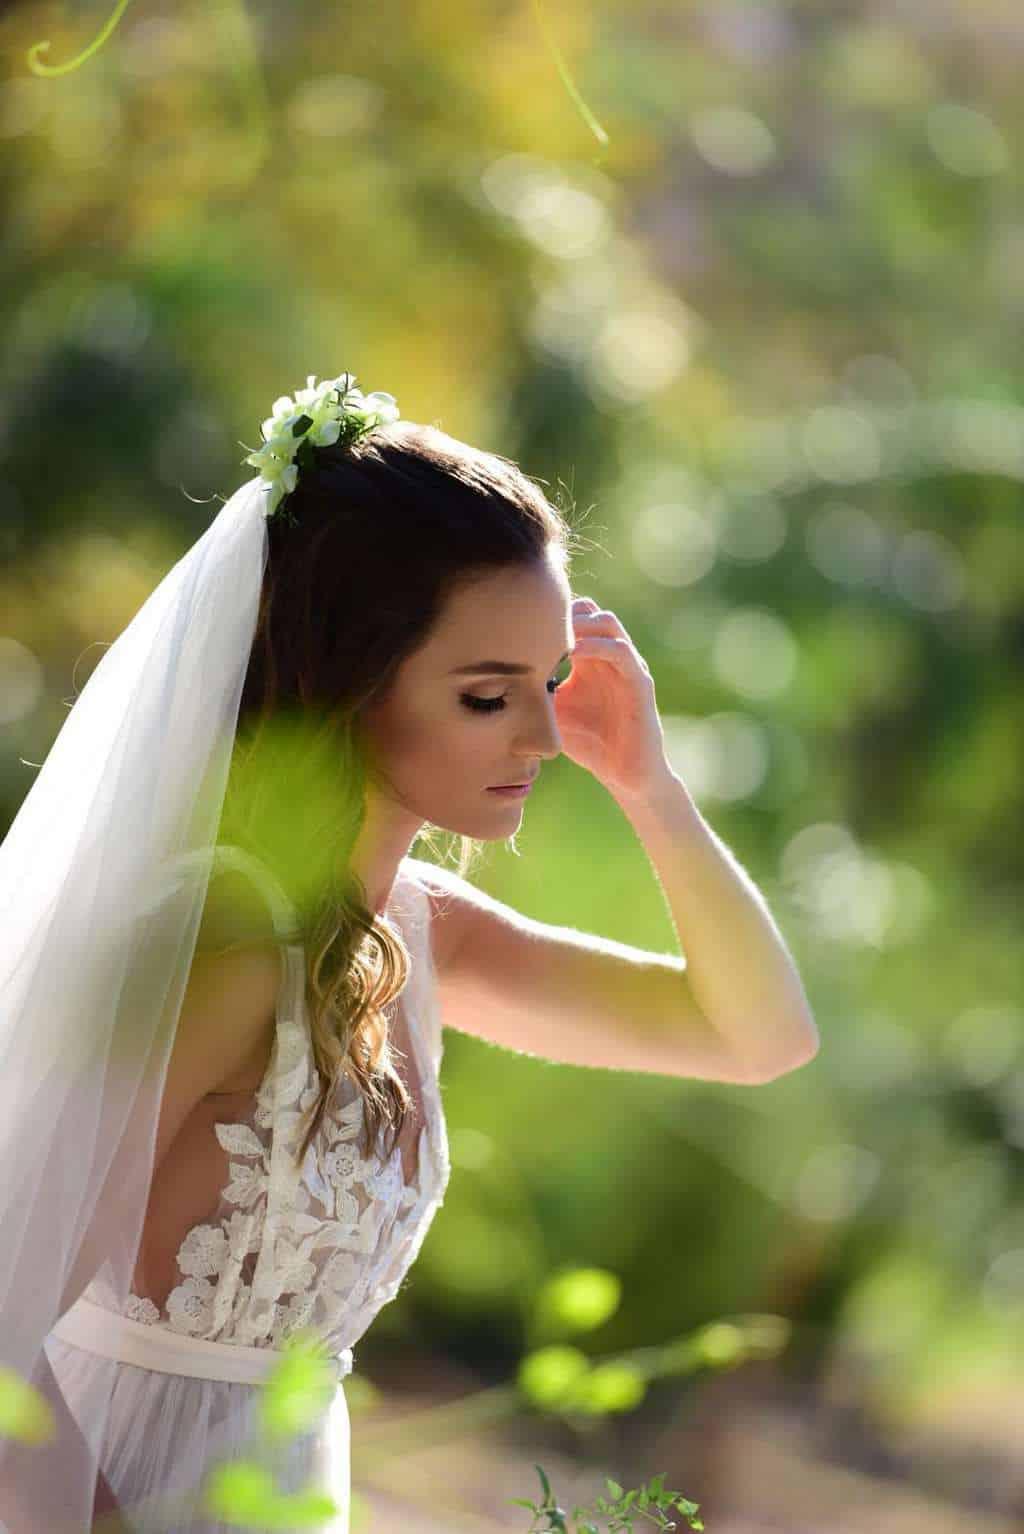 beleza-da-noiva-casamento-boho-Casamento-Nicolle-e-Pedro-casamento-rosa-Estalagem-Alter-Real-Fotografia-Estudio-Maria-Celia-Siqueira-Fotografia-Rosana-Sales-Goiania-look-da-noiva-noiva-104-1